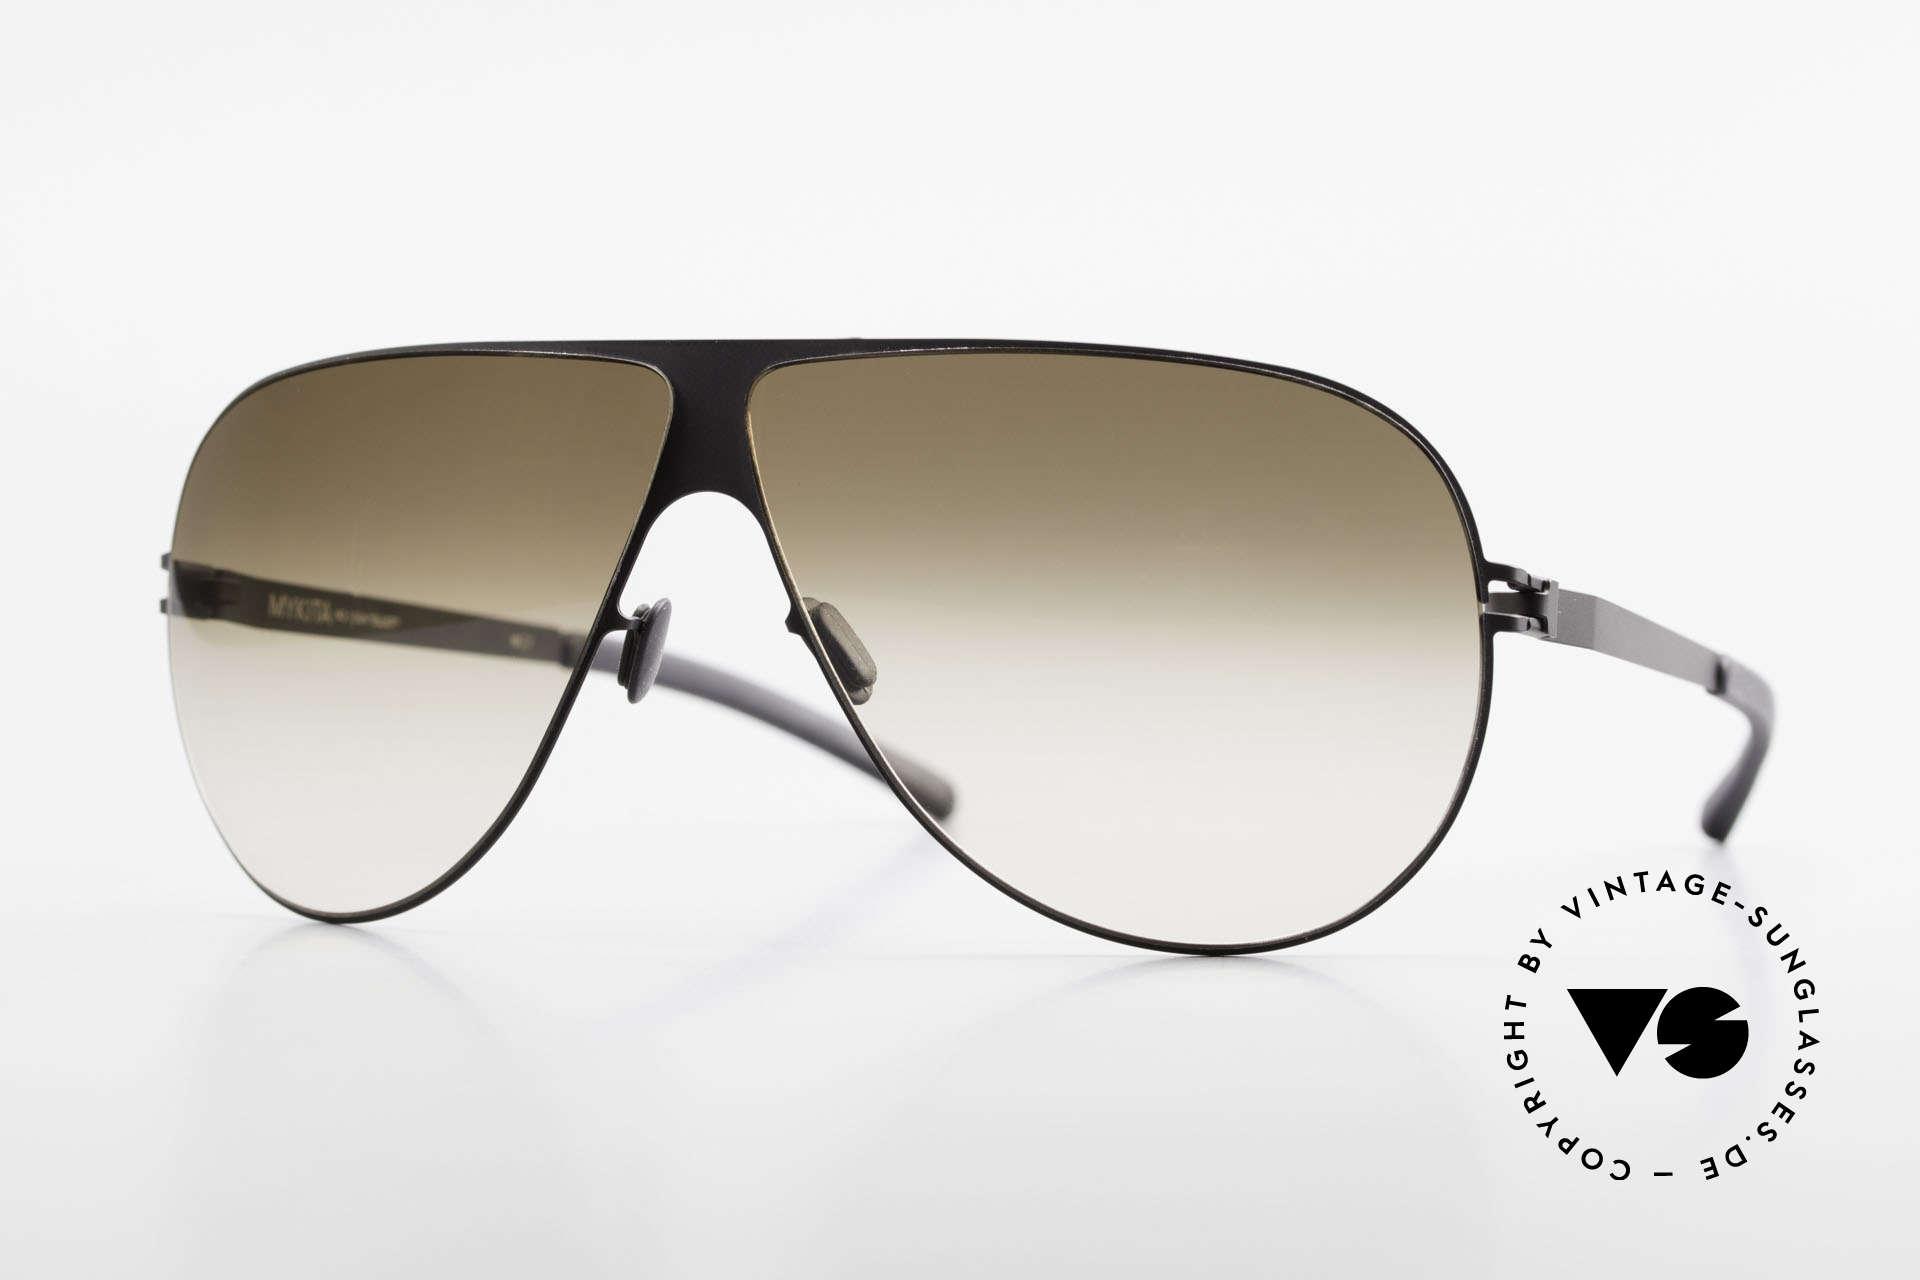 Mykita Elliot Mykita Tom Cruise Sunglasses, orig. VINTAGE Tom Cruise Mykita sunglasses from 2011, Made for Men